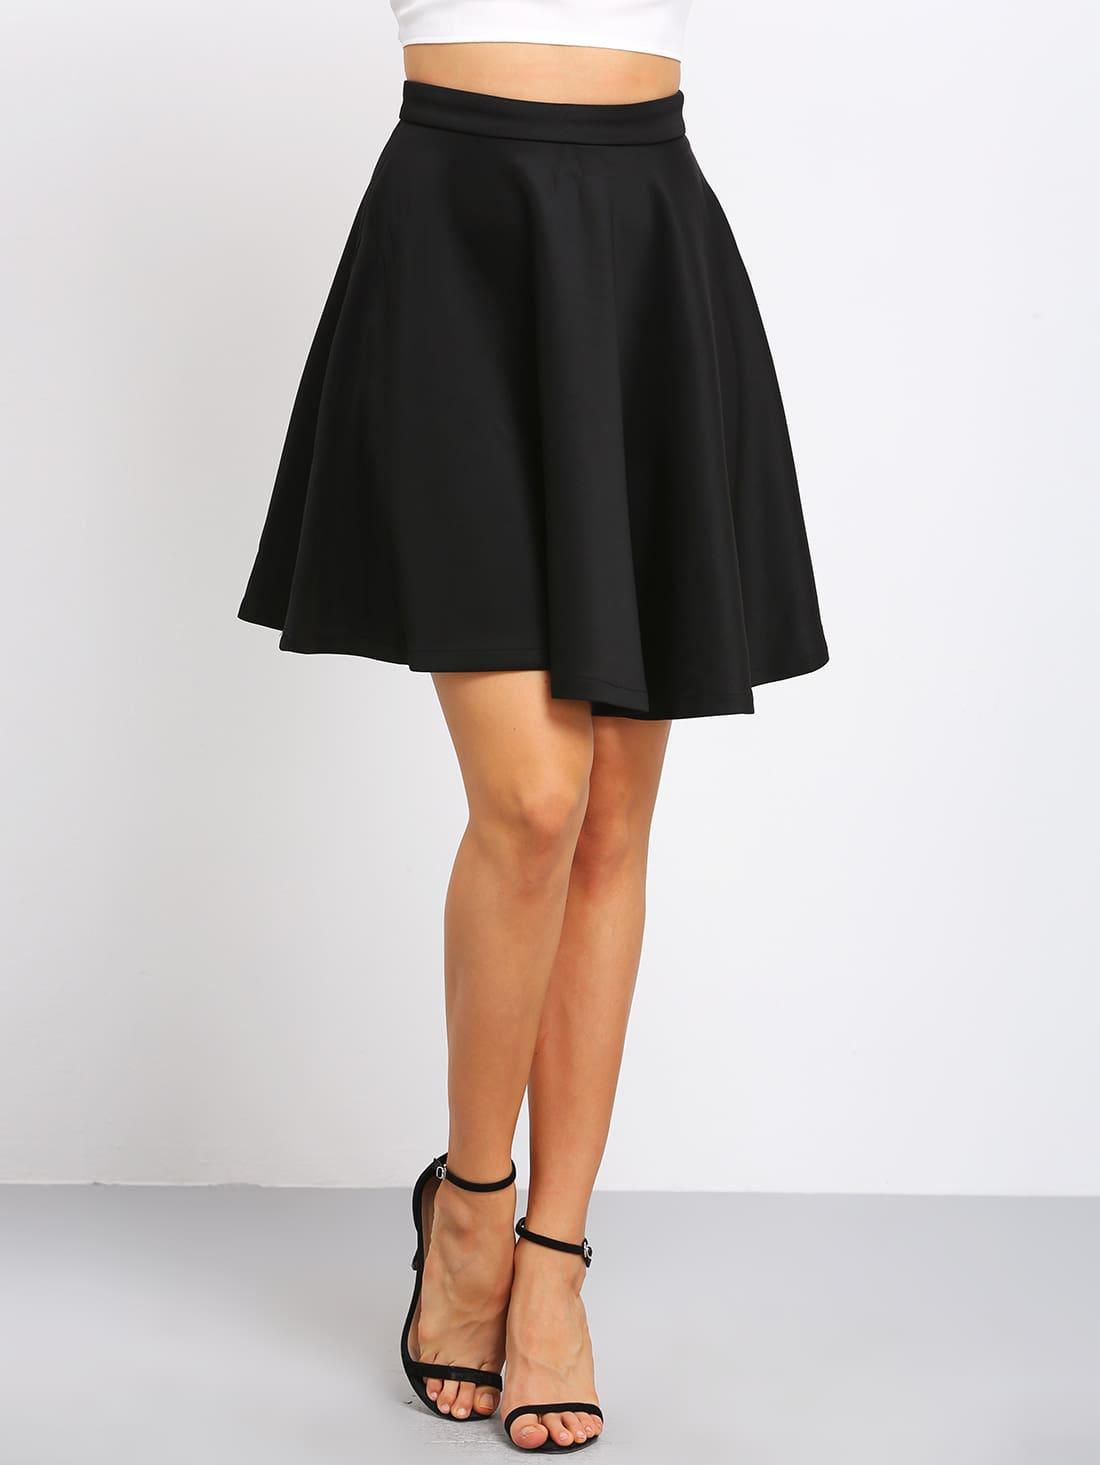 High waisted pencil skirts